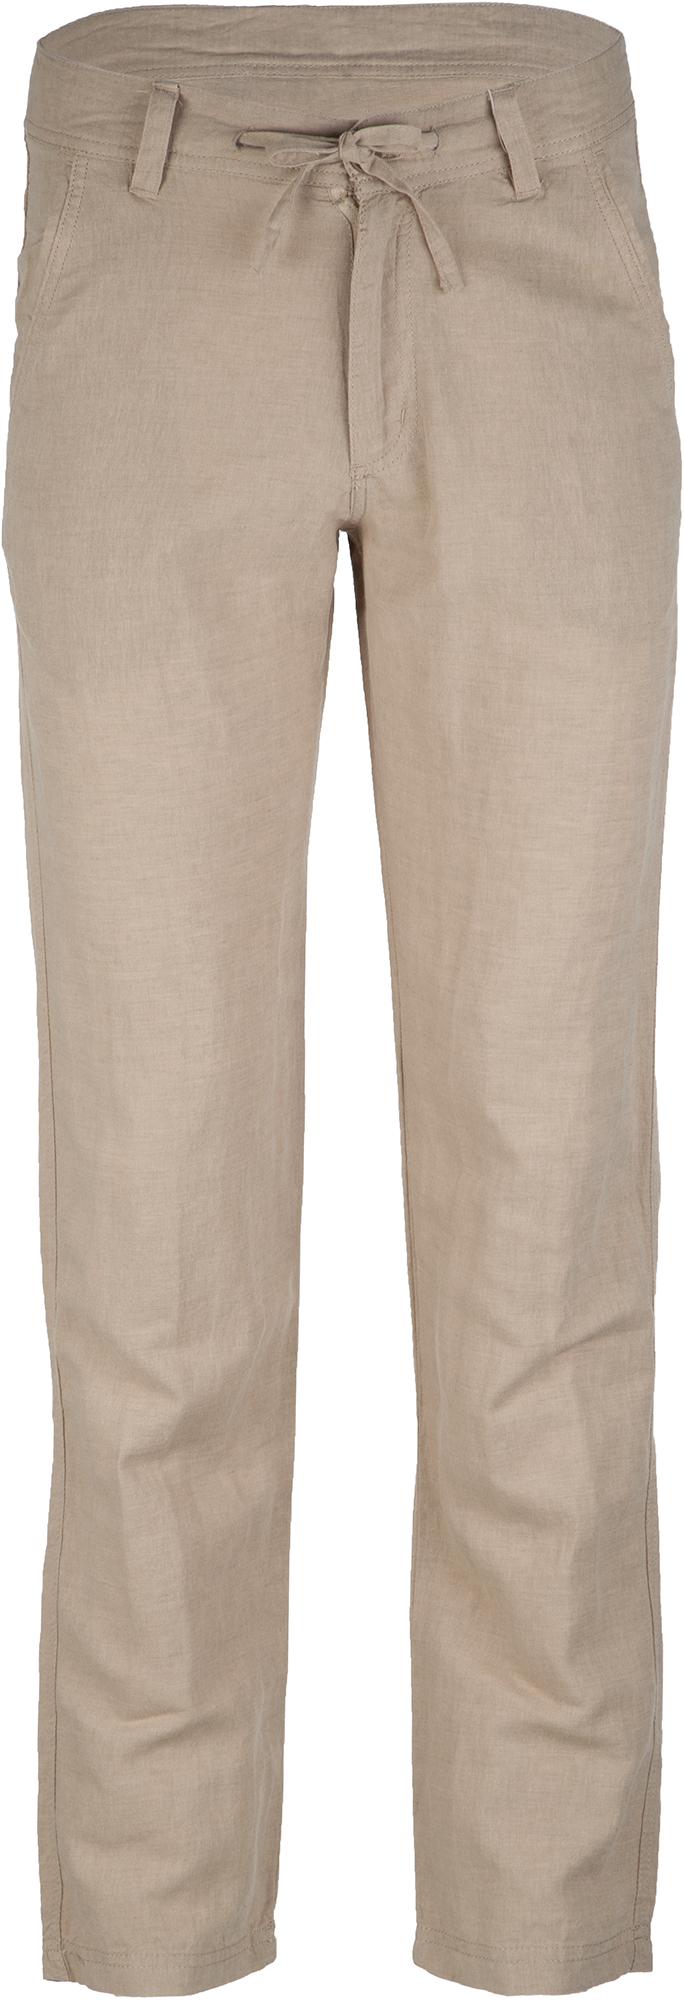 Outventure Брюки мужские Outventure, размер 52 брюки широкие из льна и хлопка